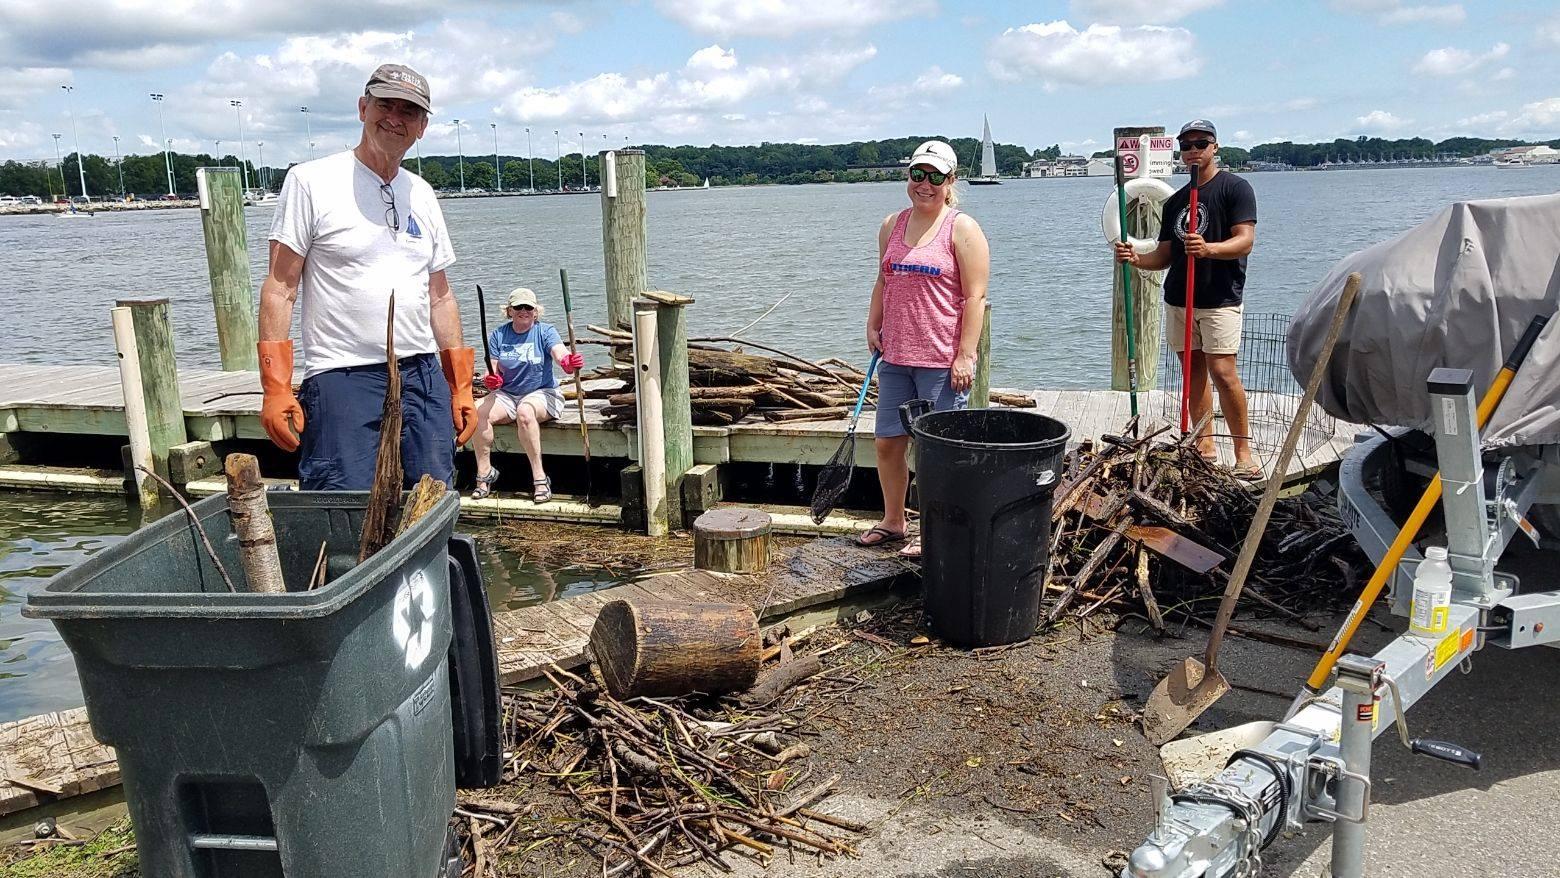 SSA debris cleanup volunteers. Photo courtesy of SSA Facebook page